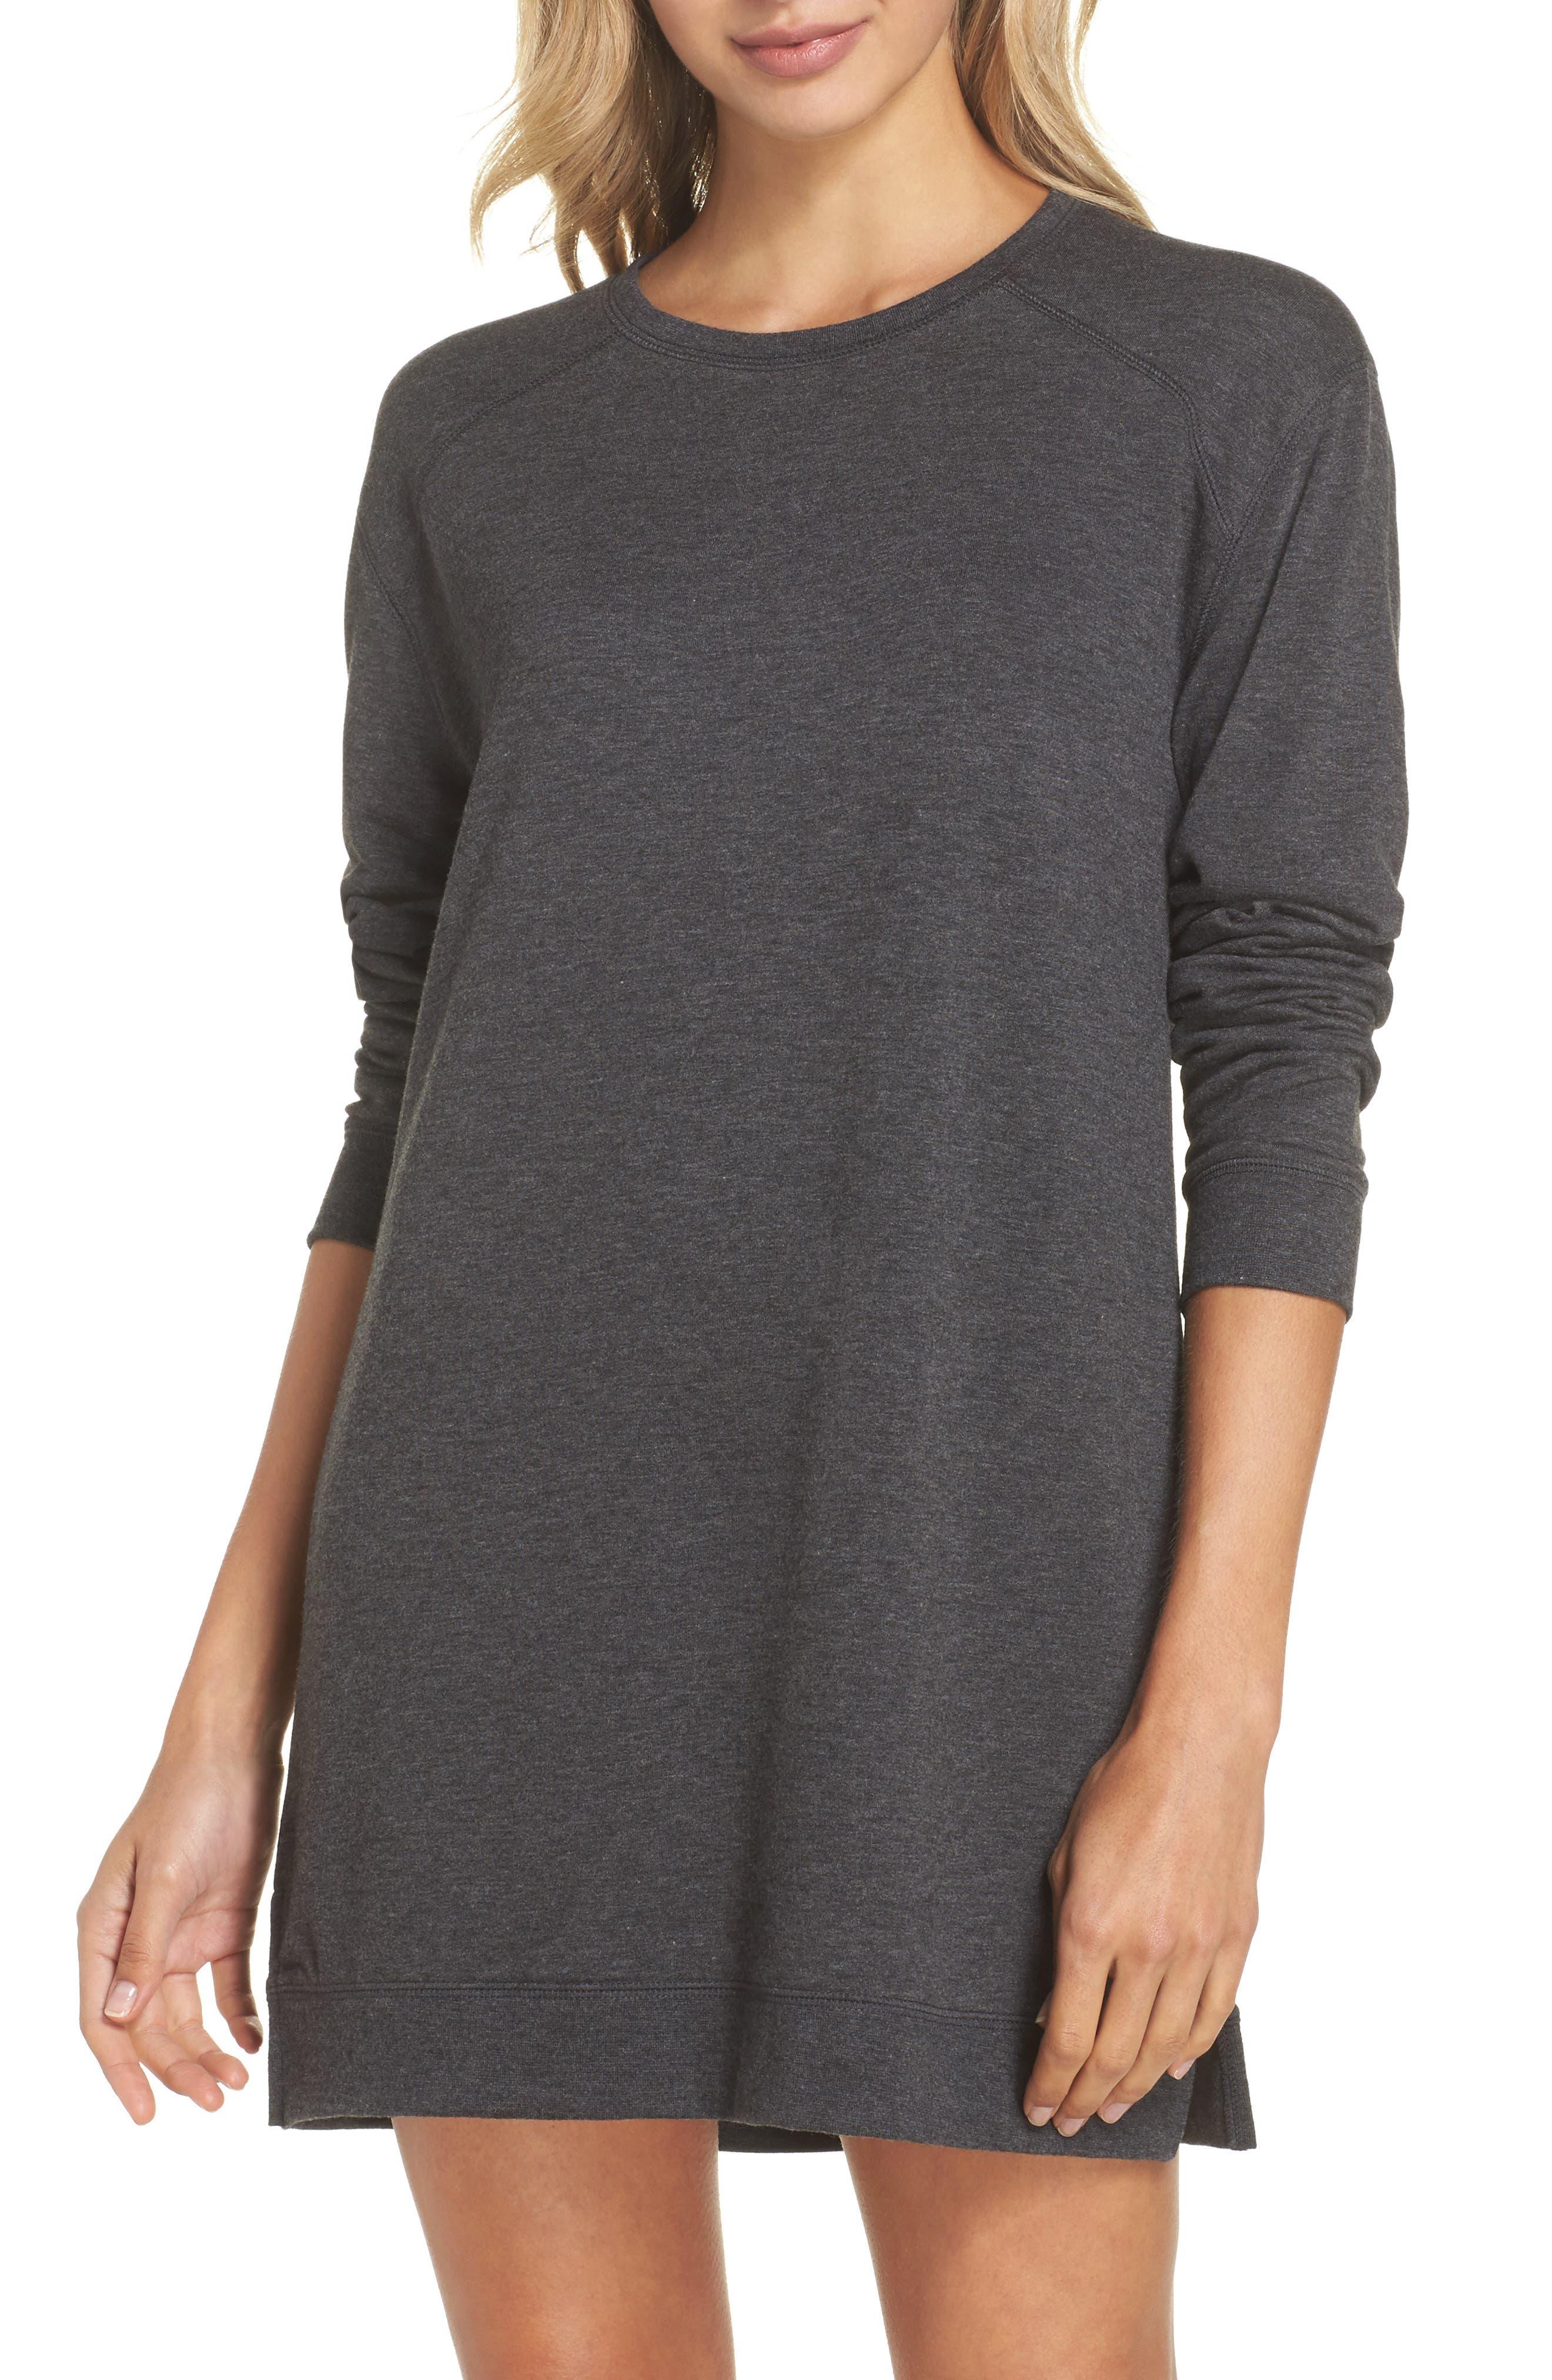 Sleepy Tunic Shirt,                         Main,                         color, Grey Wolf Heather